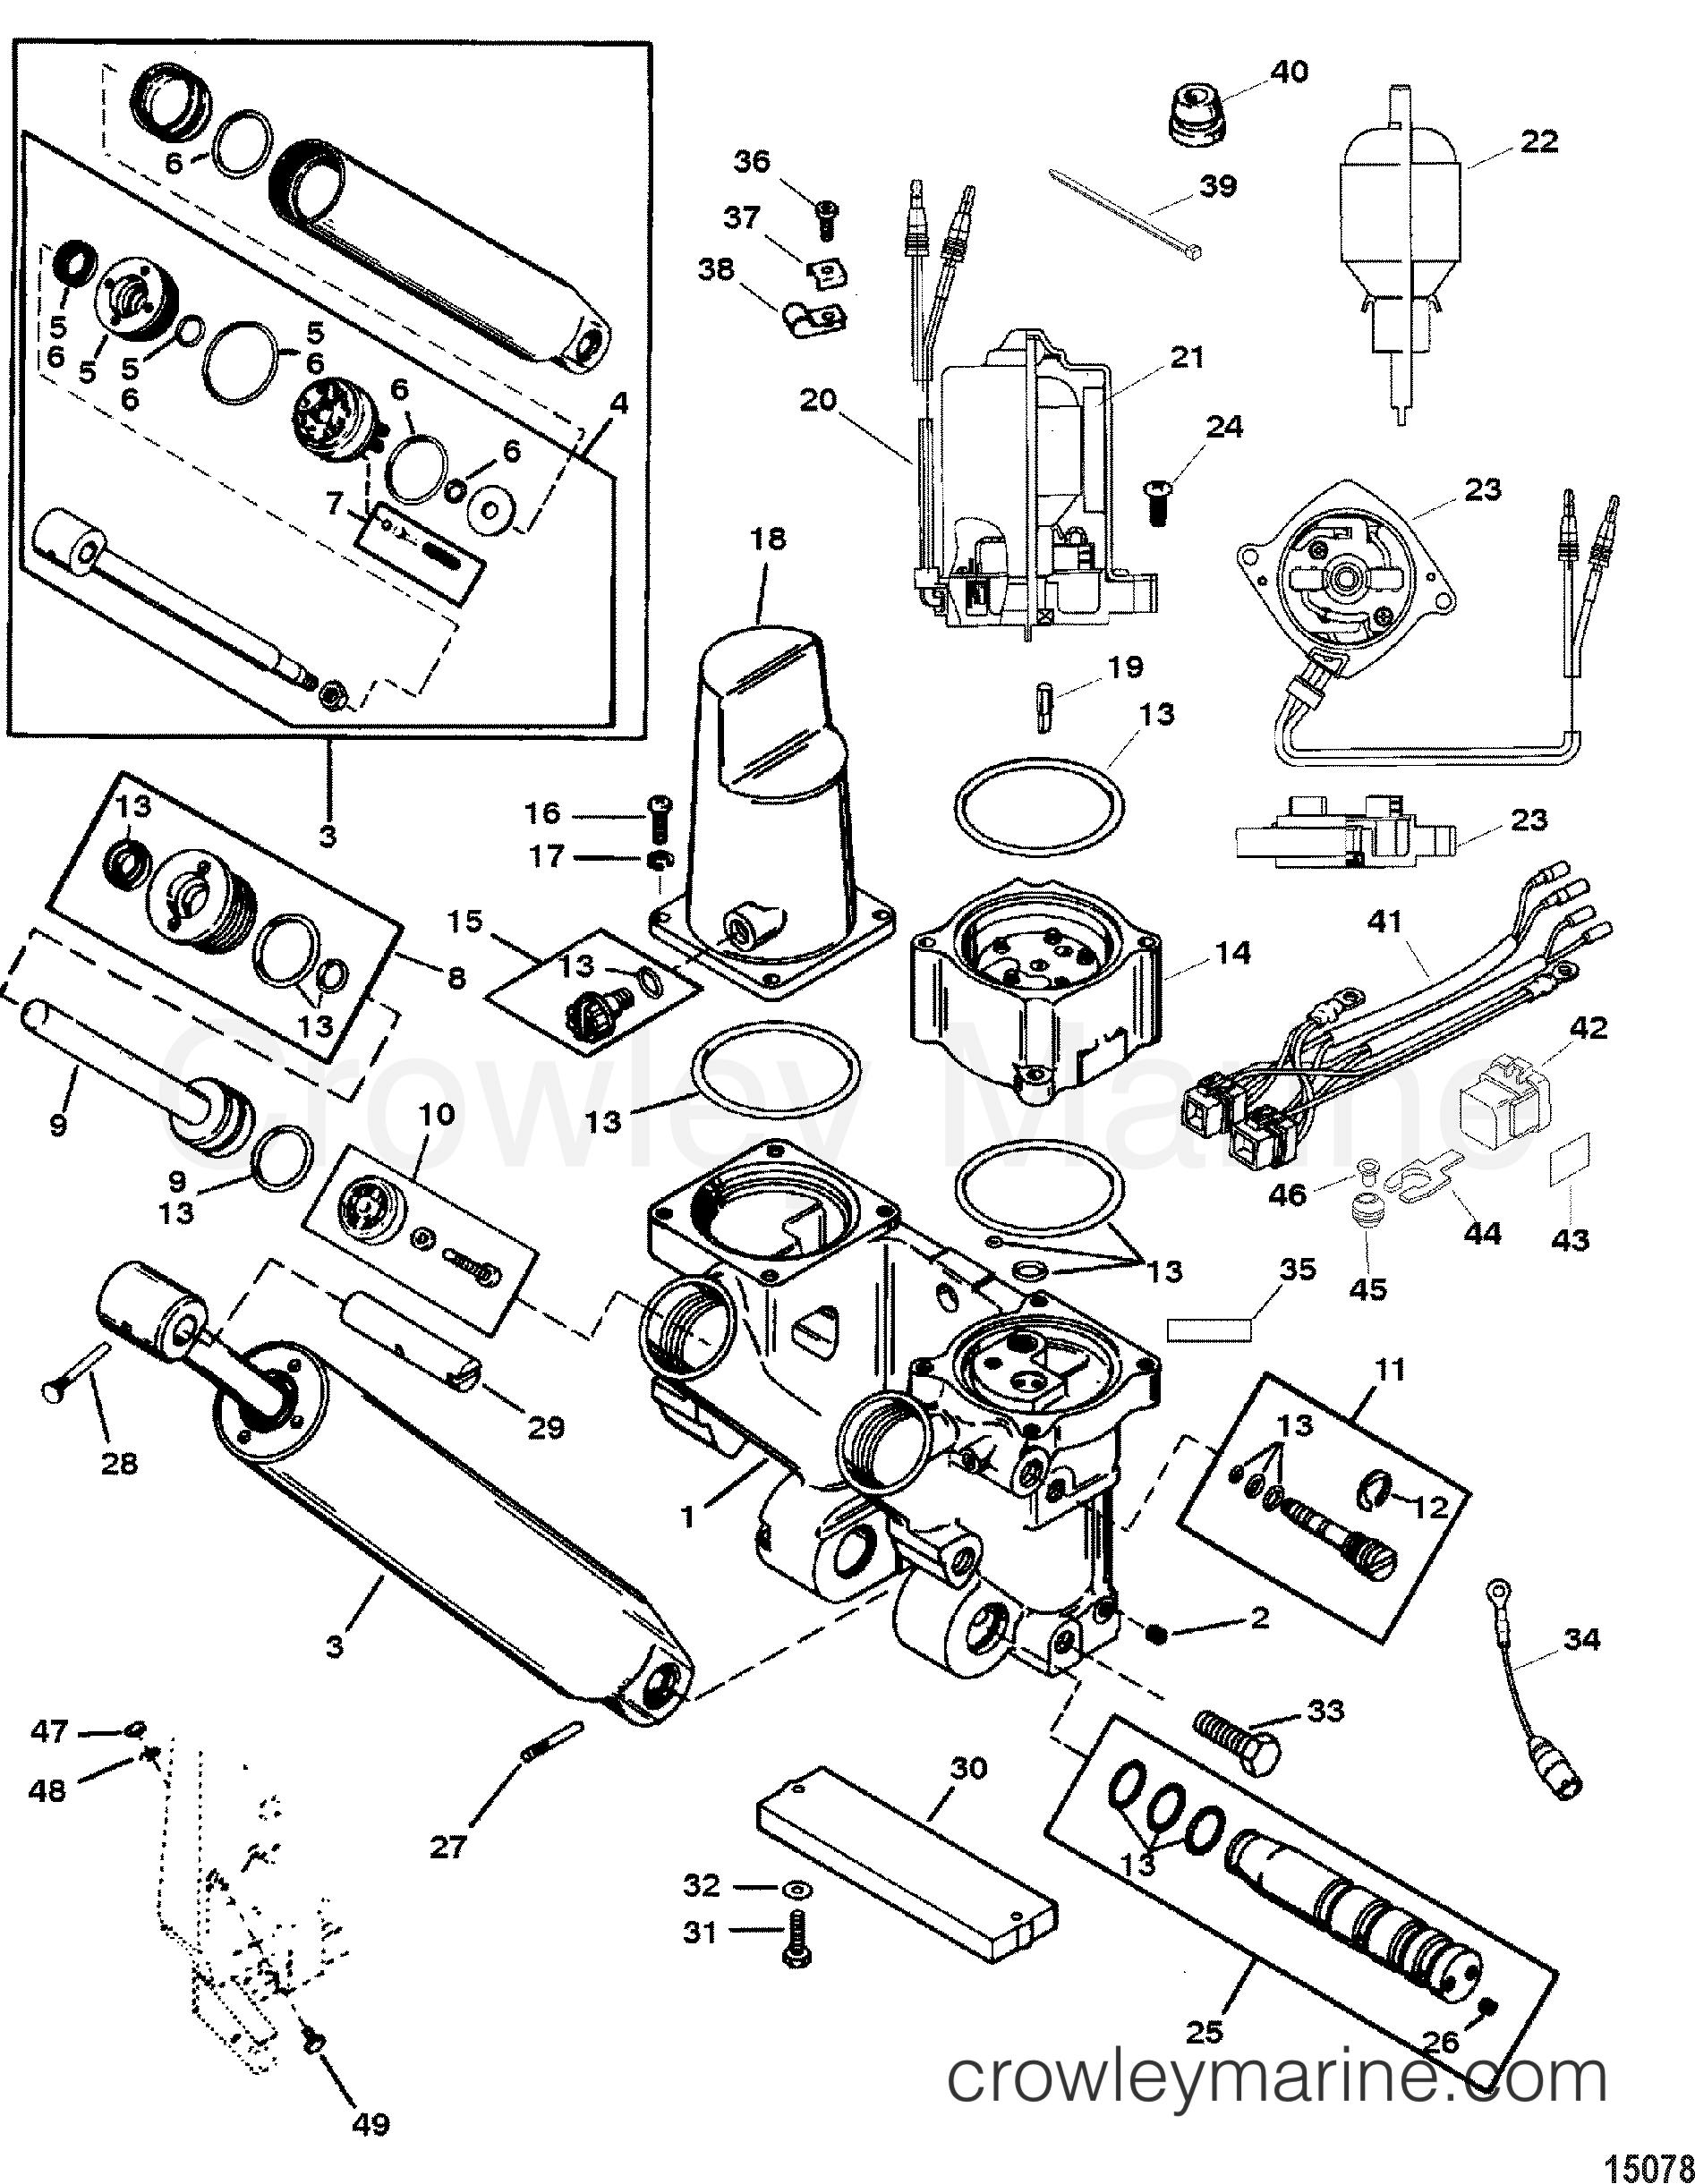 ... Diagram Luxury Yamaha R1 Wiring Source · power trim and tilt kit  826729a4 various years rigging parts trim rh crowleymarine com Mercury Power